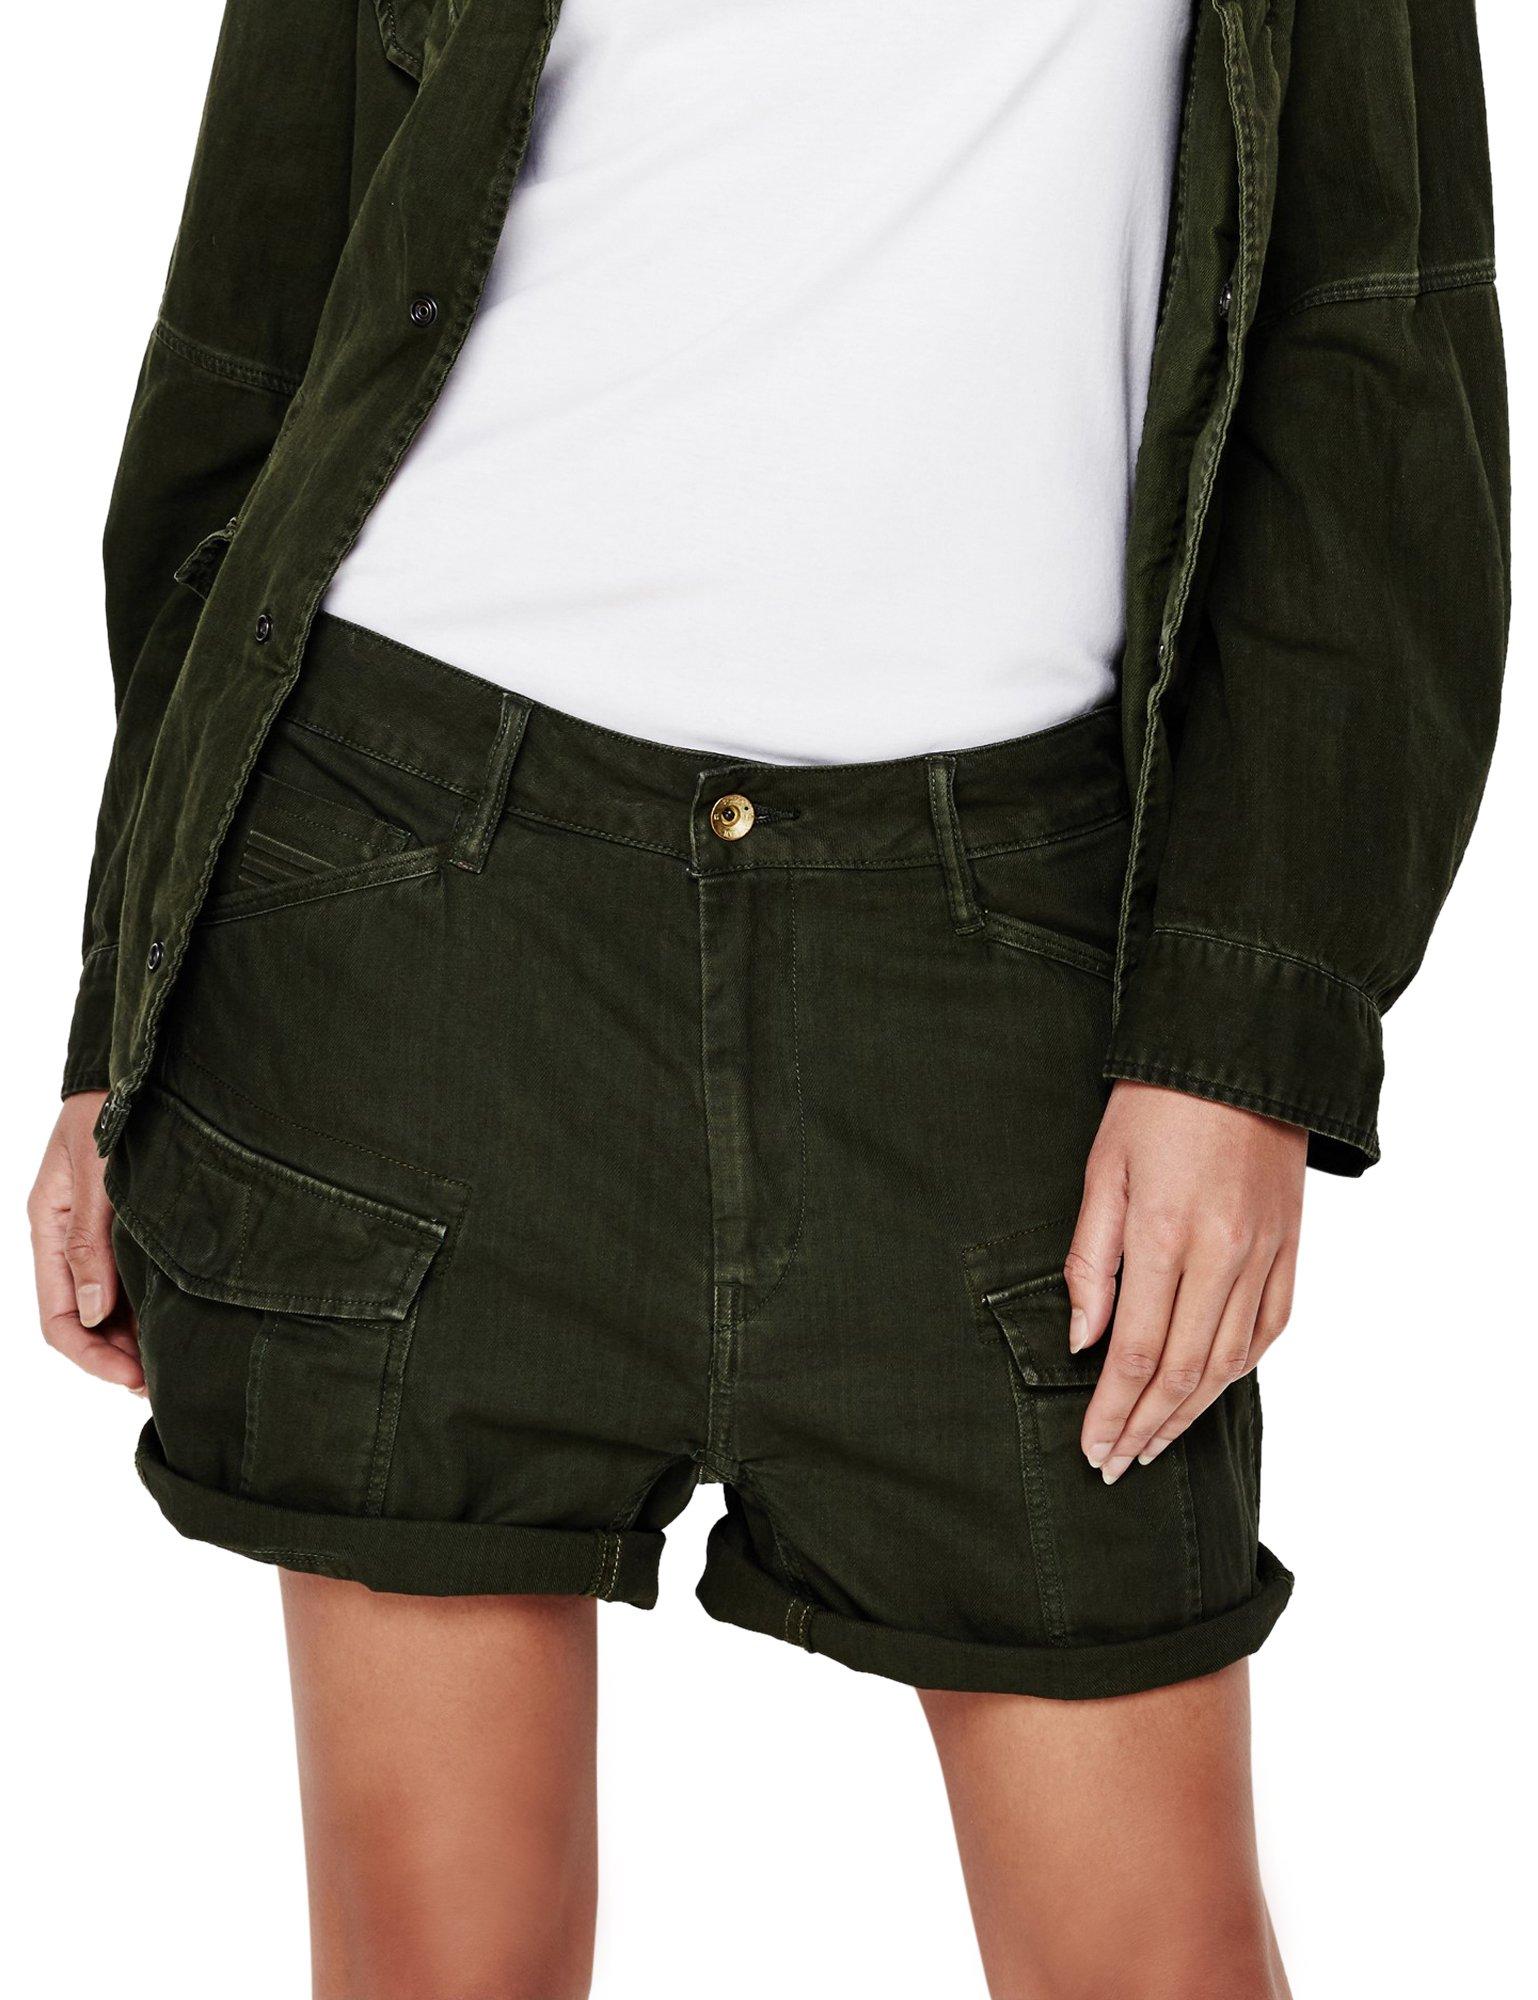 G-Star Women's Rovic Shorts Woman Green in Size 26 Green